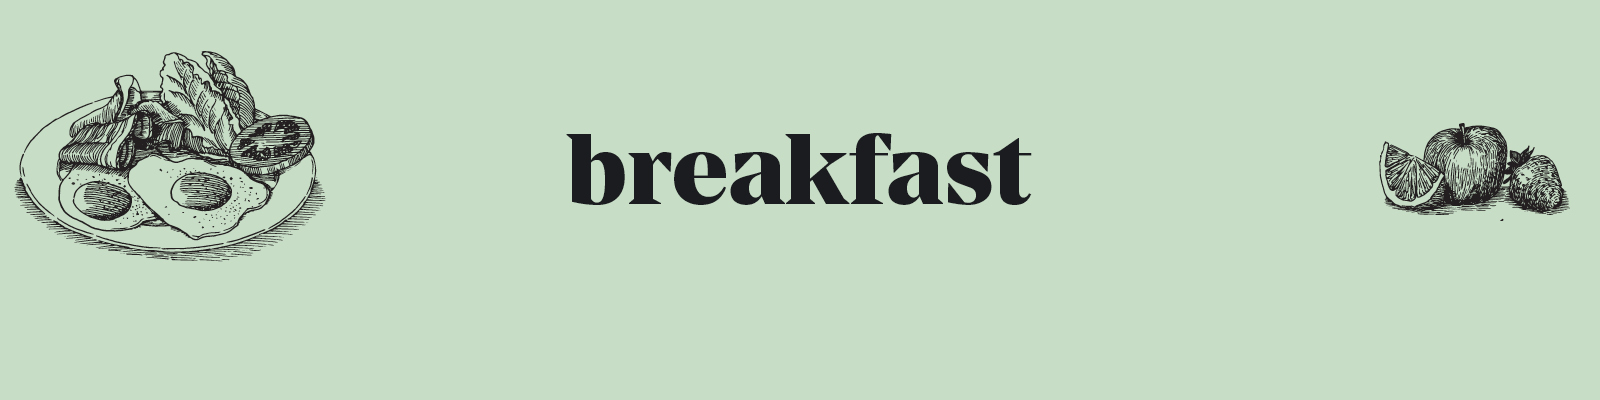 CoverPhotosRVSD_Breakfast1600x400.jpg